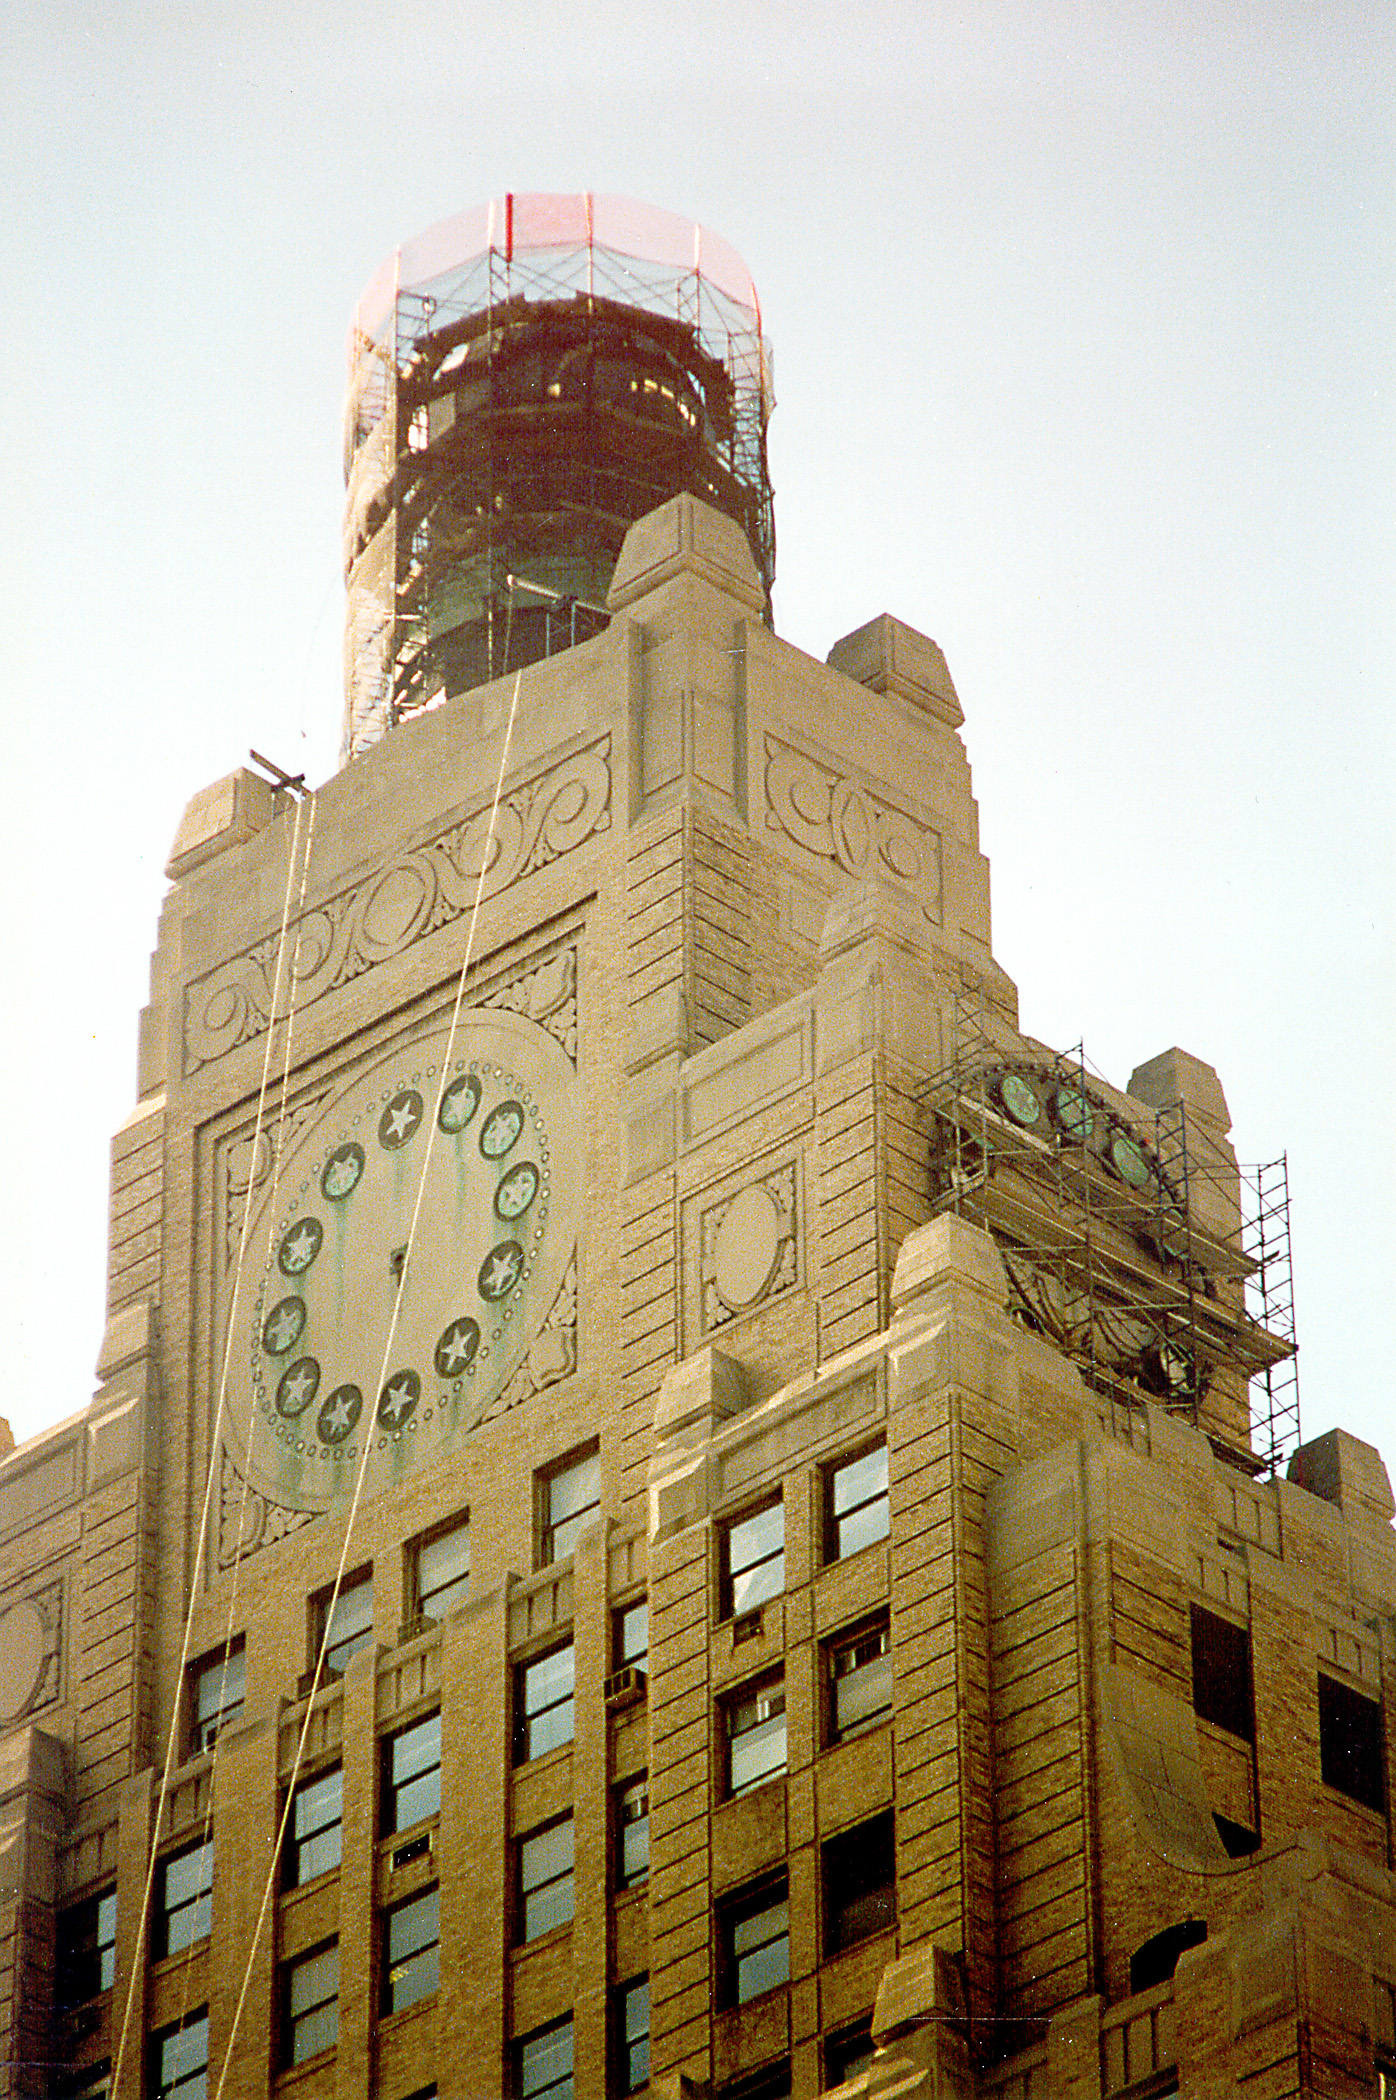 Globe & Clock Restoration. Tobin Parnes Design. New York, NY. Historic Preservation. Pre-Construction Work.